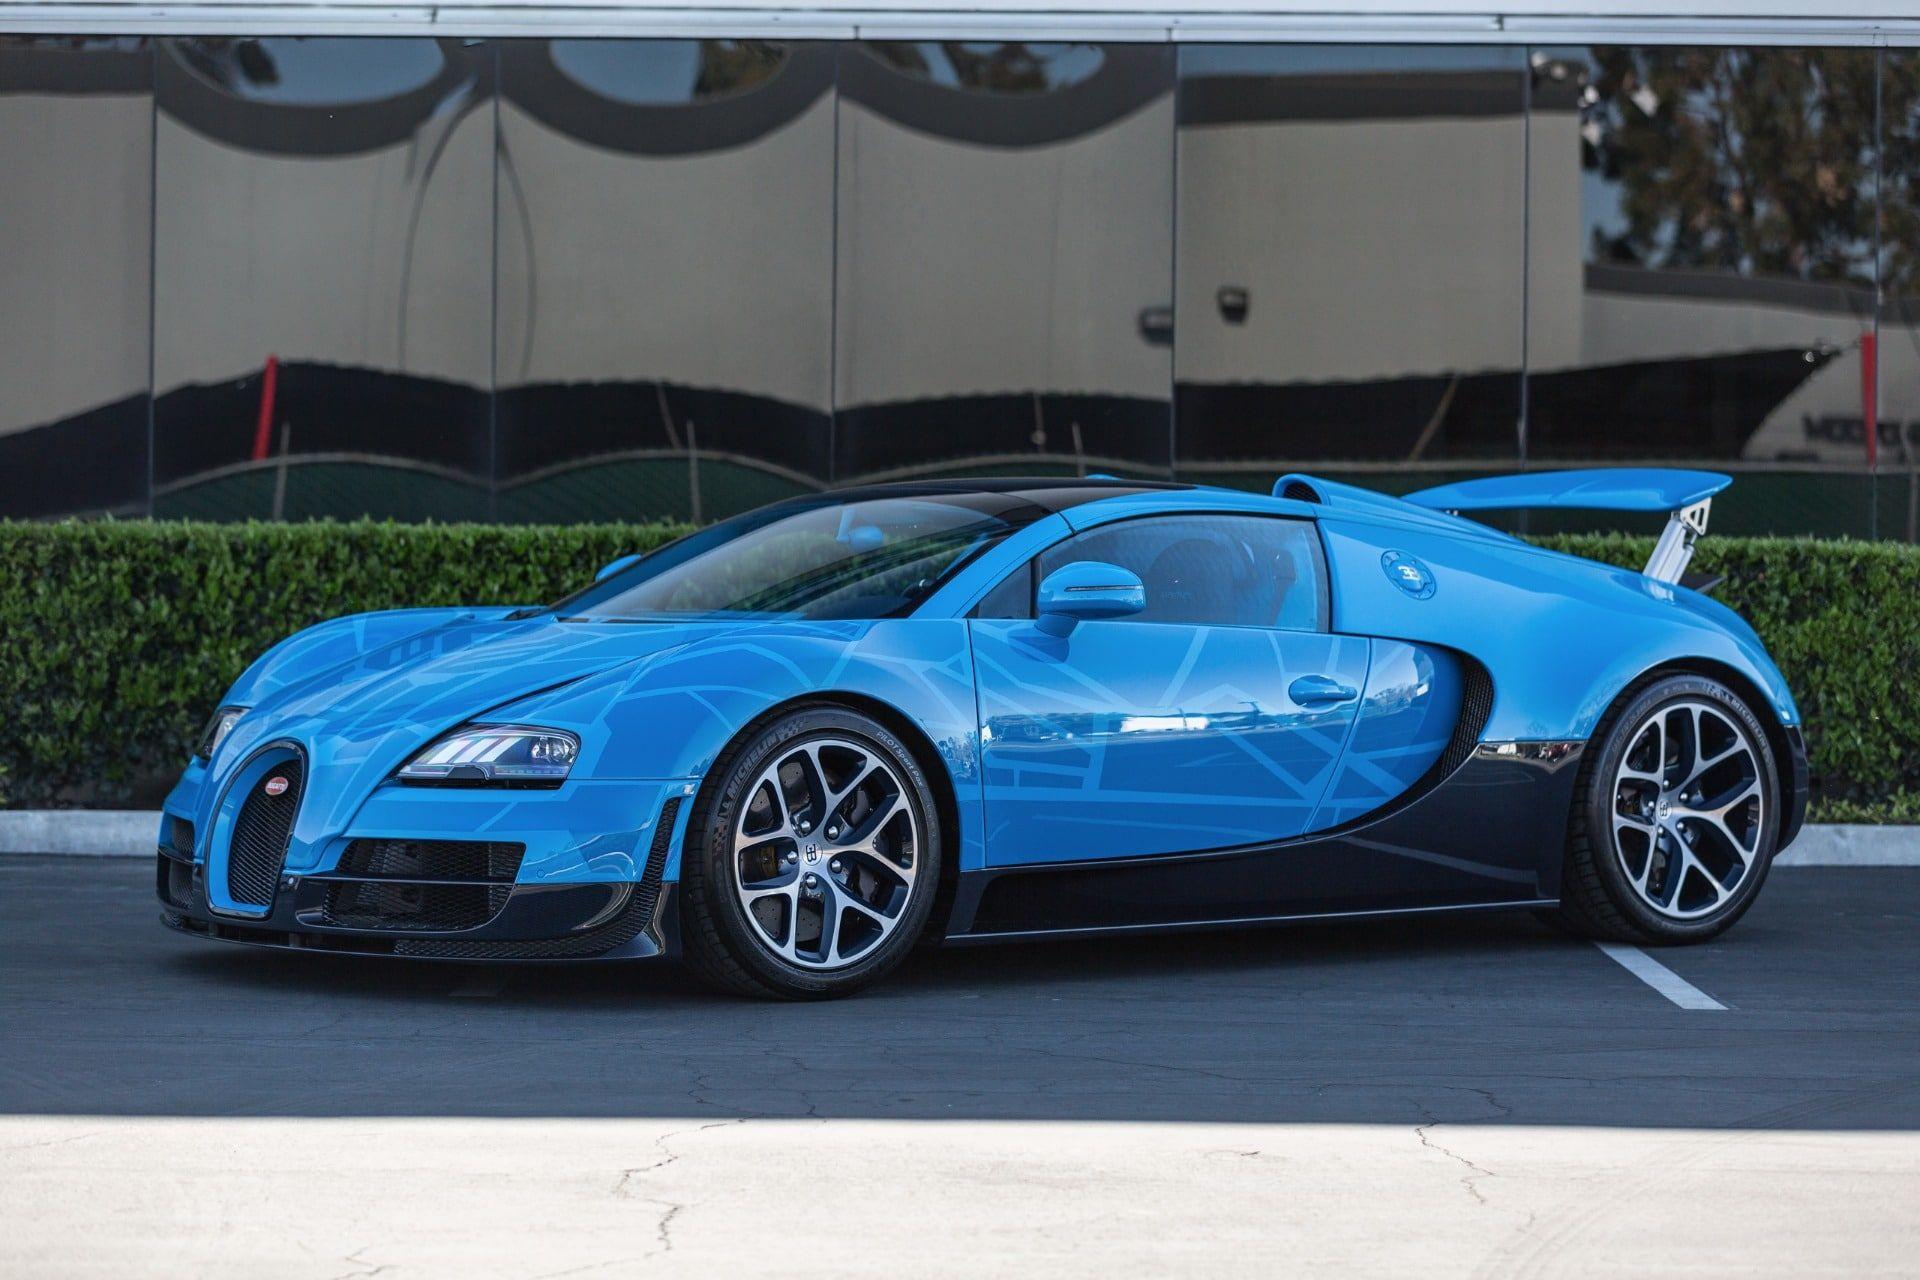 bd60cdd26c2a6ea7344592bded4838ea Extraordinary Bugatti Veyron Price In Bangladesh Cars Trend